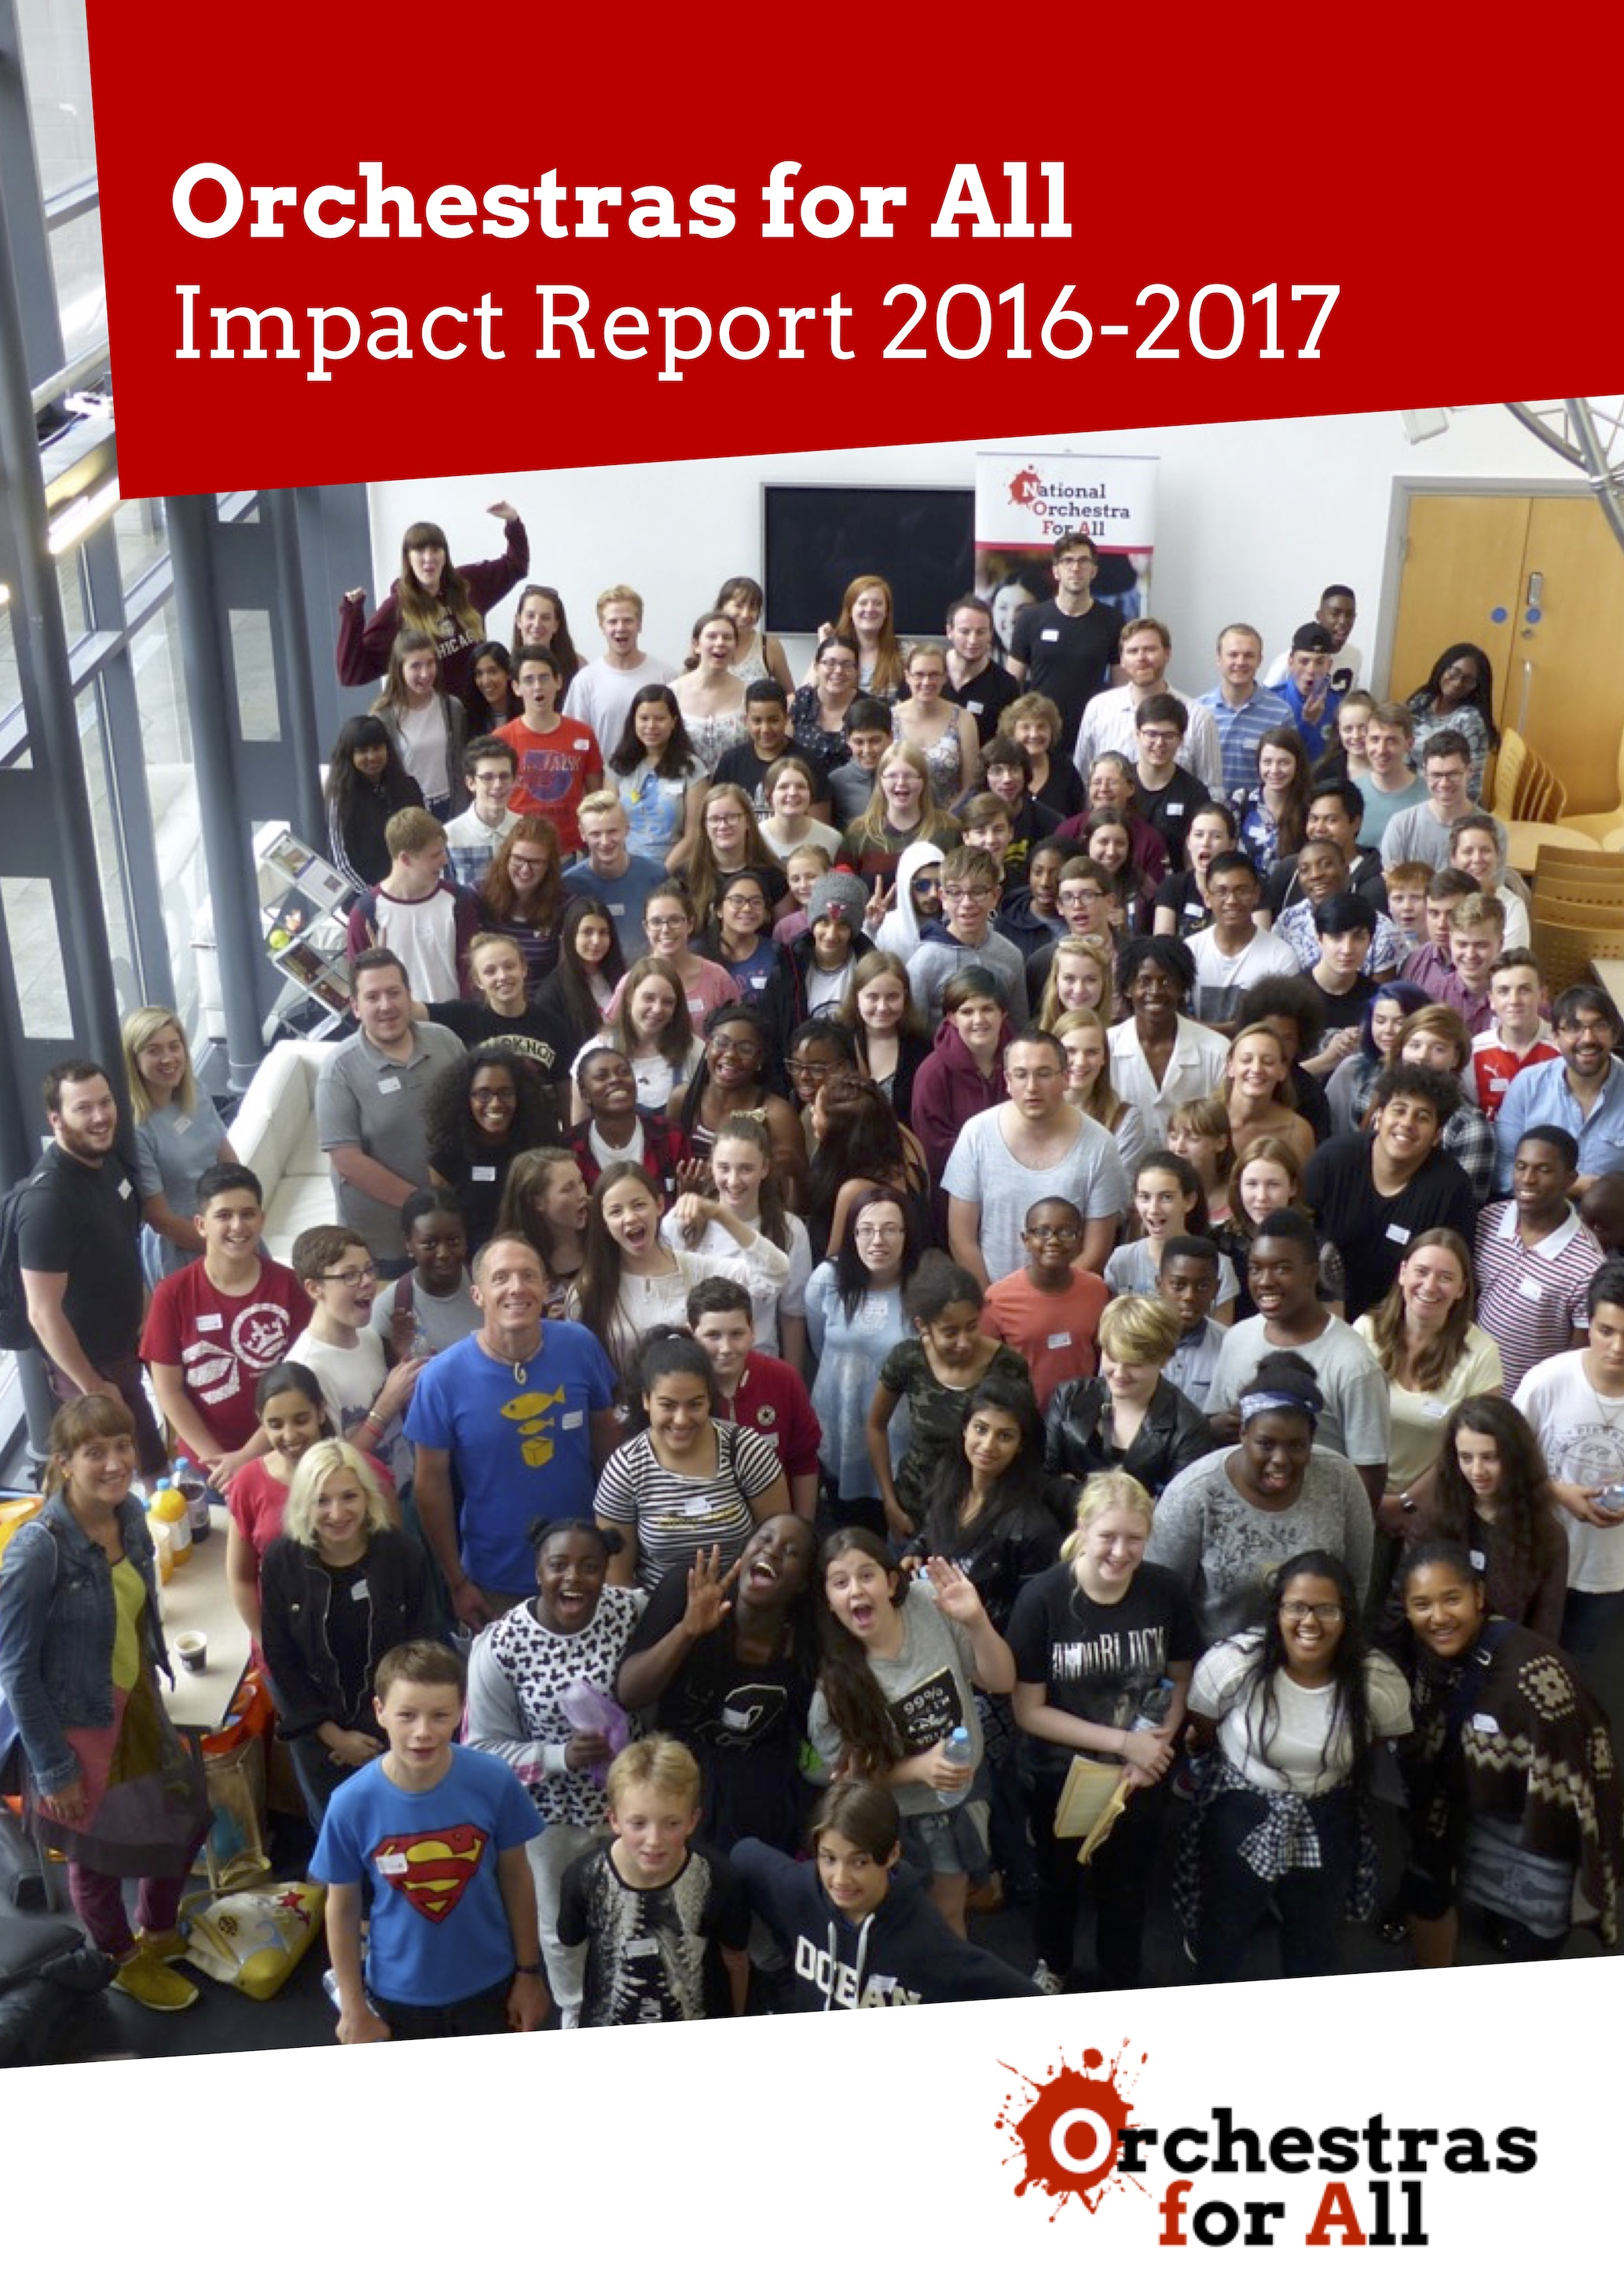 Impact Report 2016-2017 HR.jpg